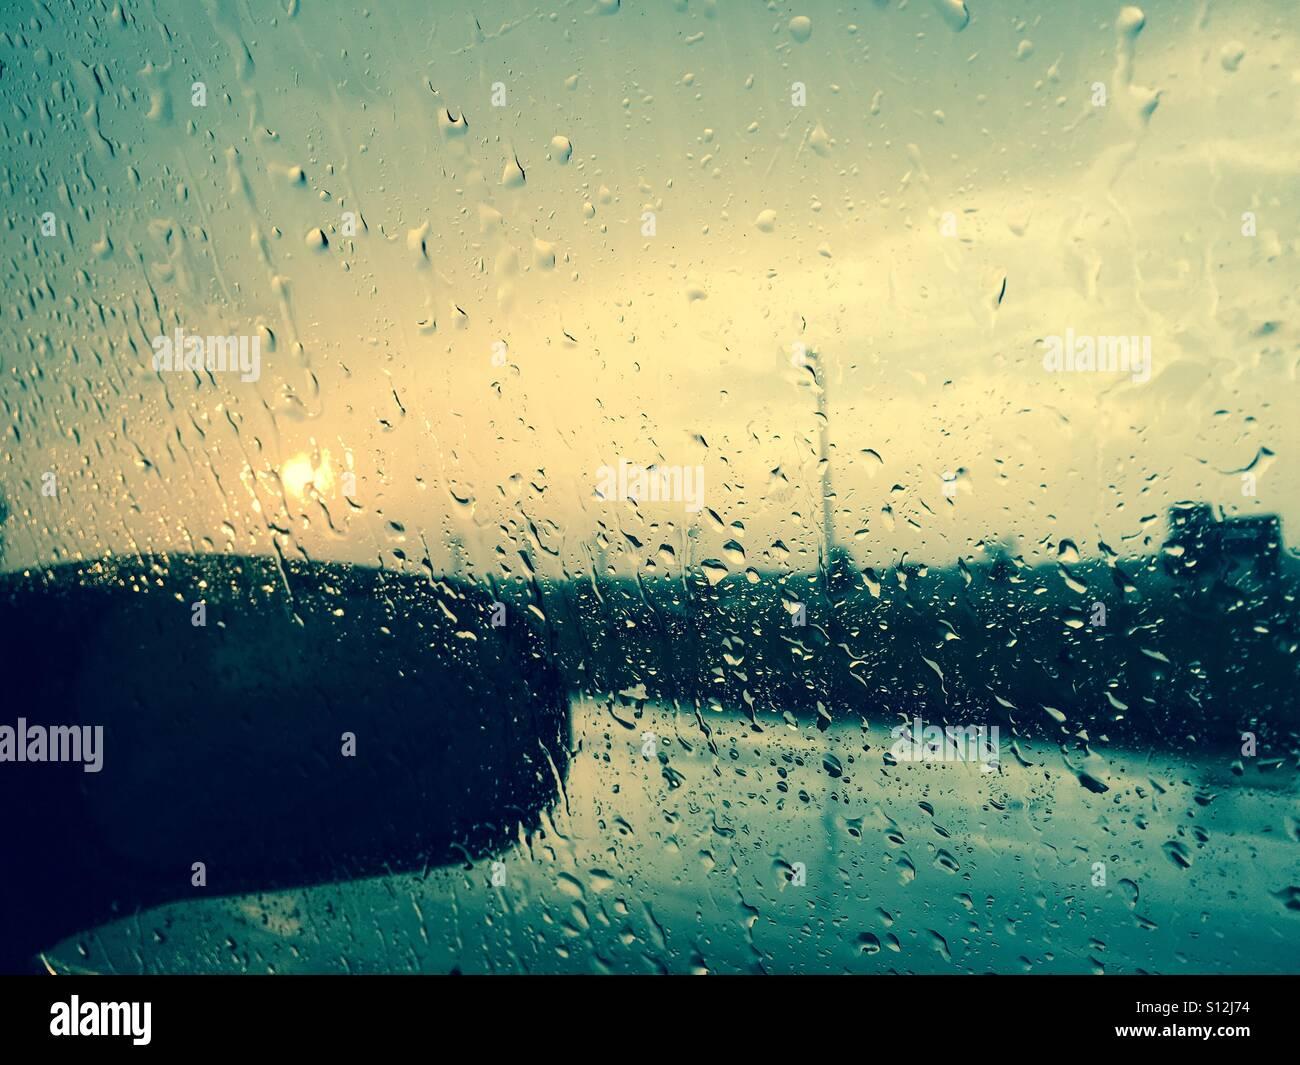 rainy-weather-in-columbus-ohio-at-twilight-noir-instagram-grunge-feel-S12J74.jpg